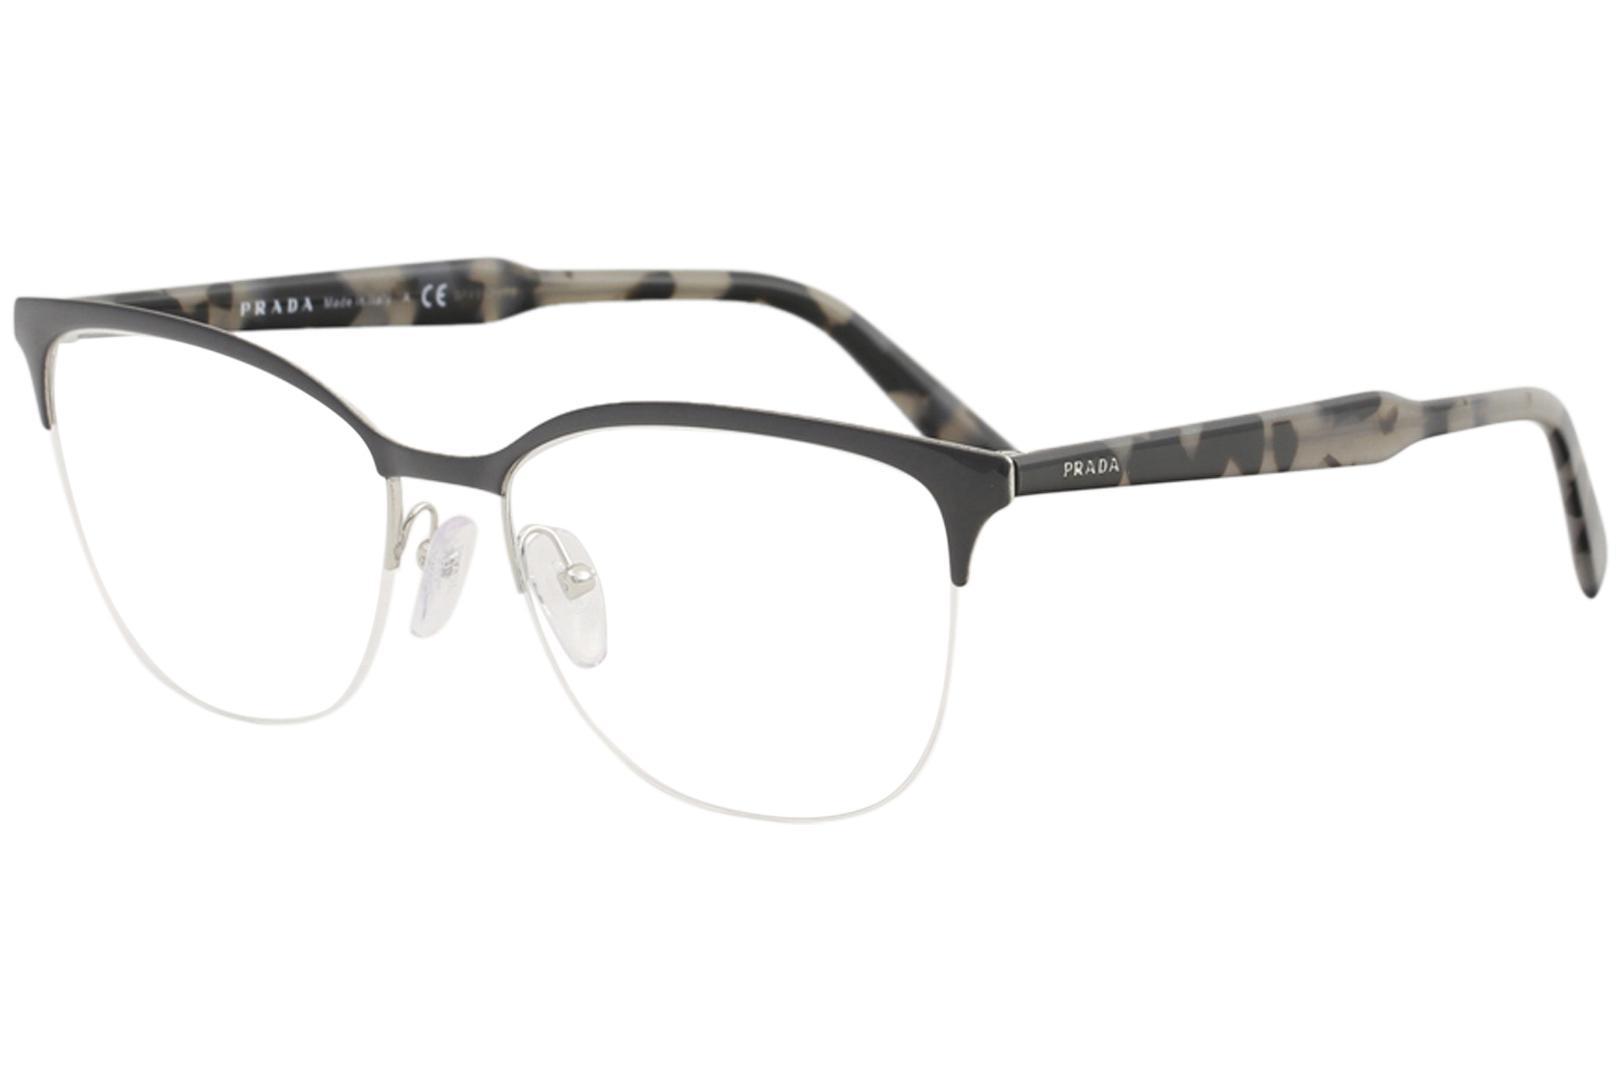 19deba5e6496 Prada Men's Eyeglasses VPR53V VPR/53/V Half Rim Optical Frame